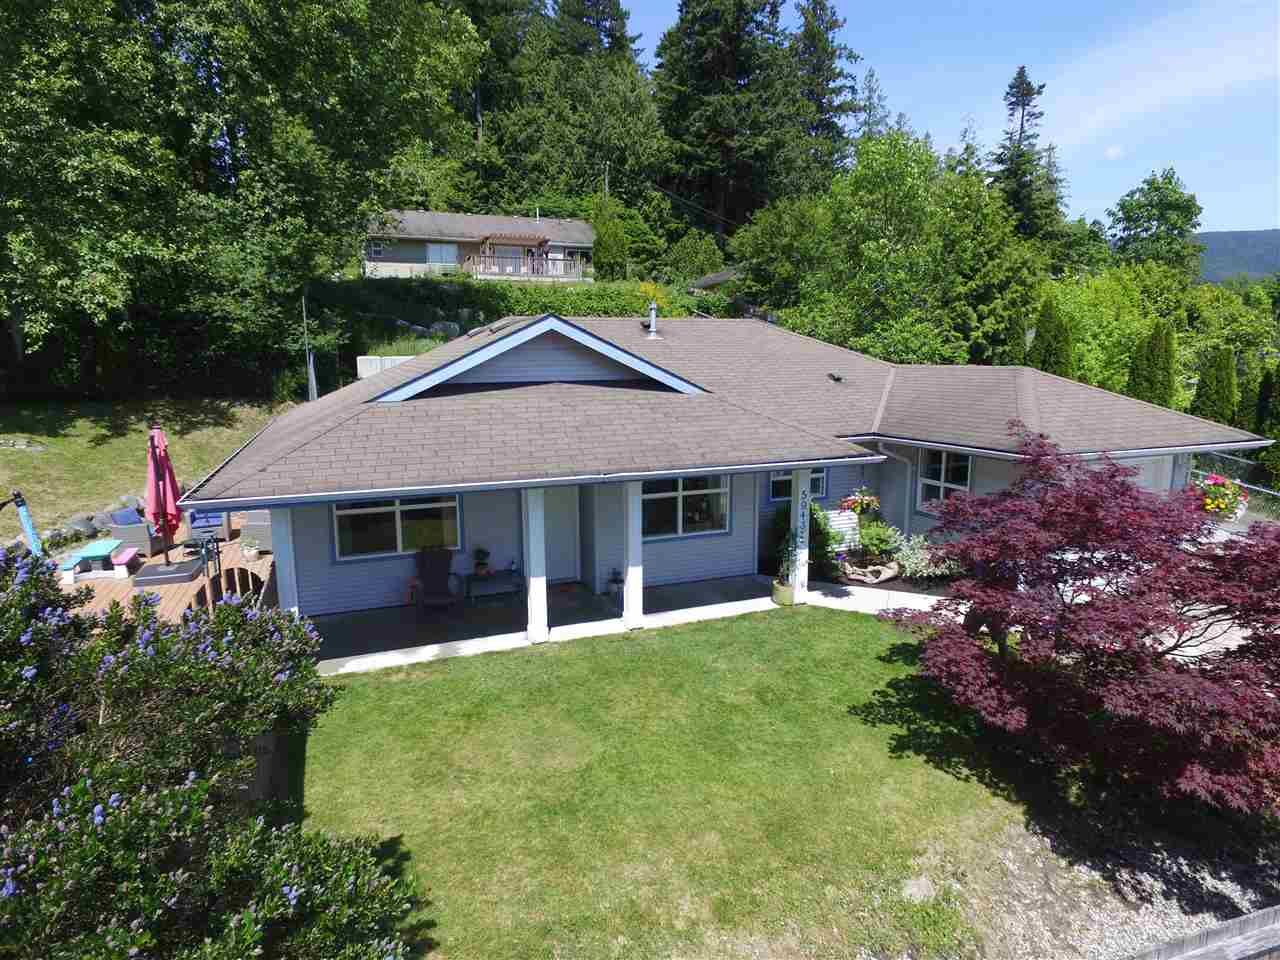 Main Photo: 5943 ST ANDREWS Place in Sechelt: Sechelt District House for sale (Sunshine Coast)  : MLS®# R2459726